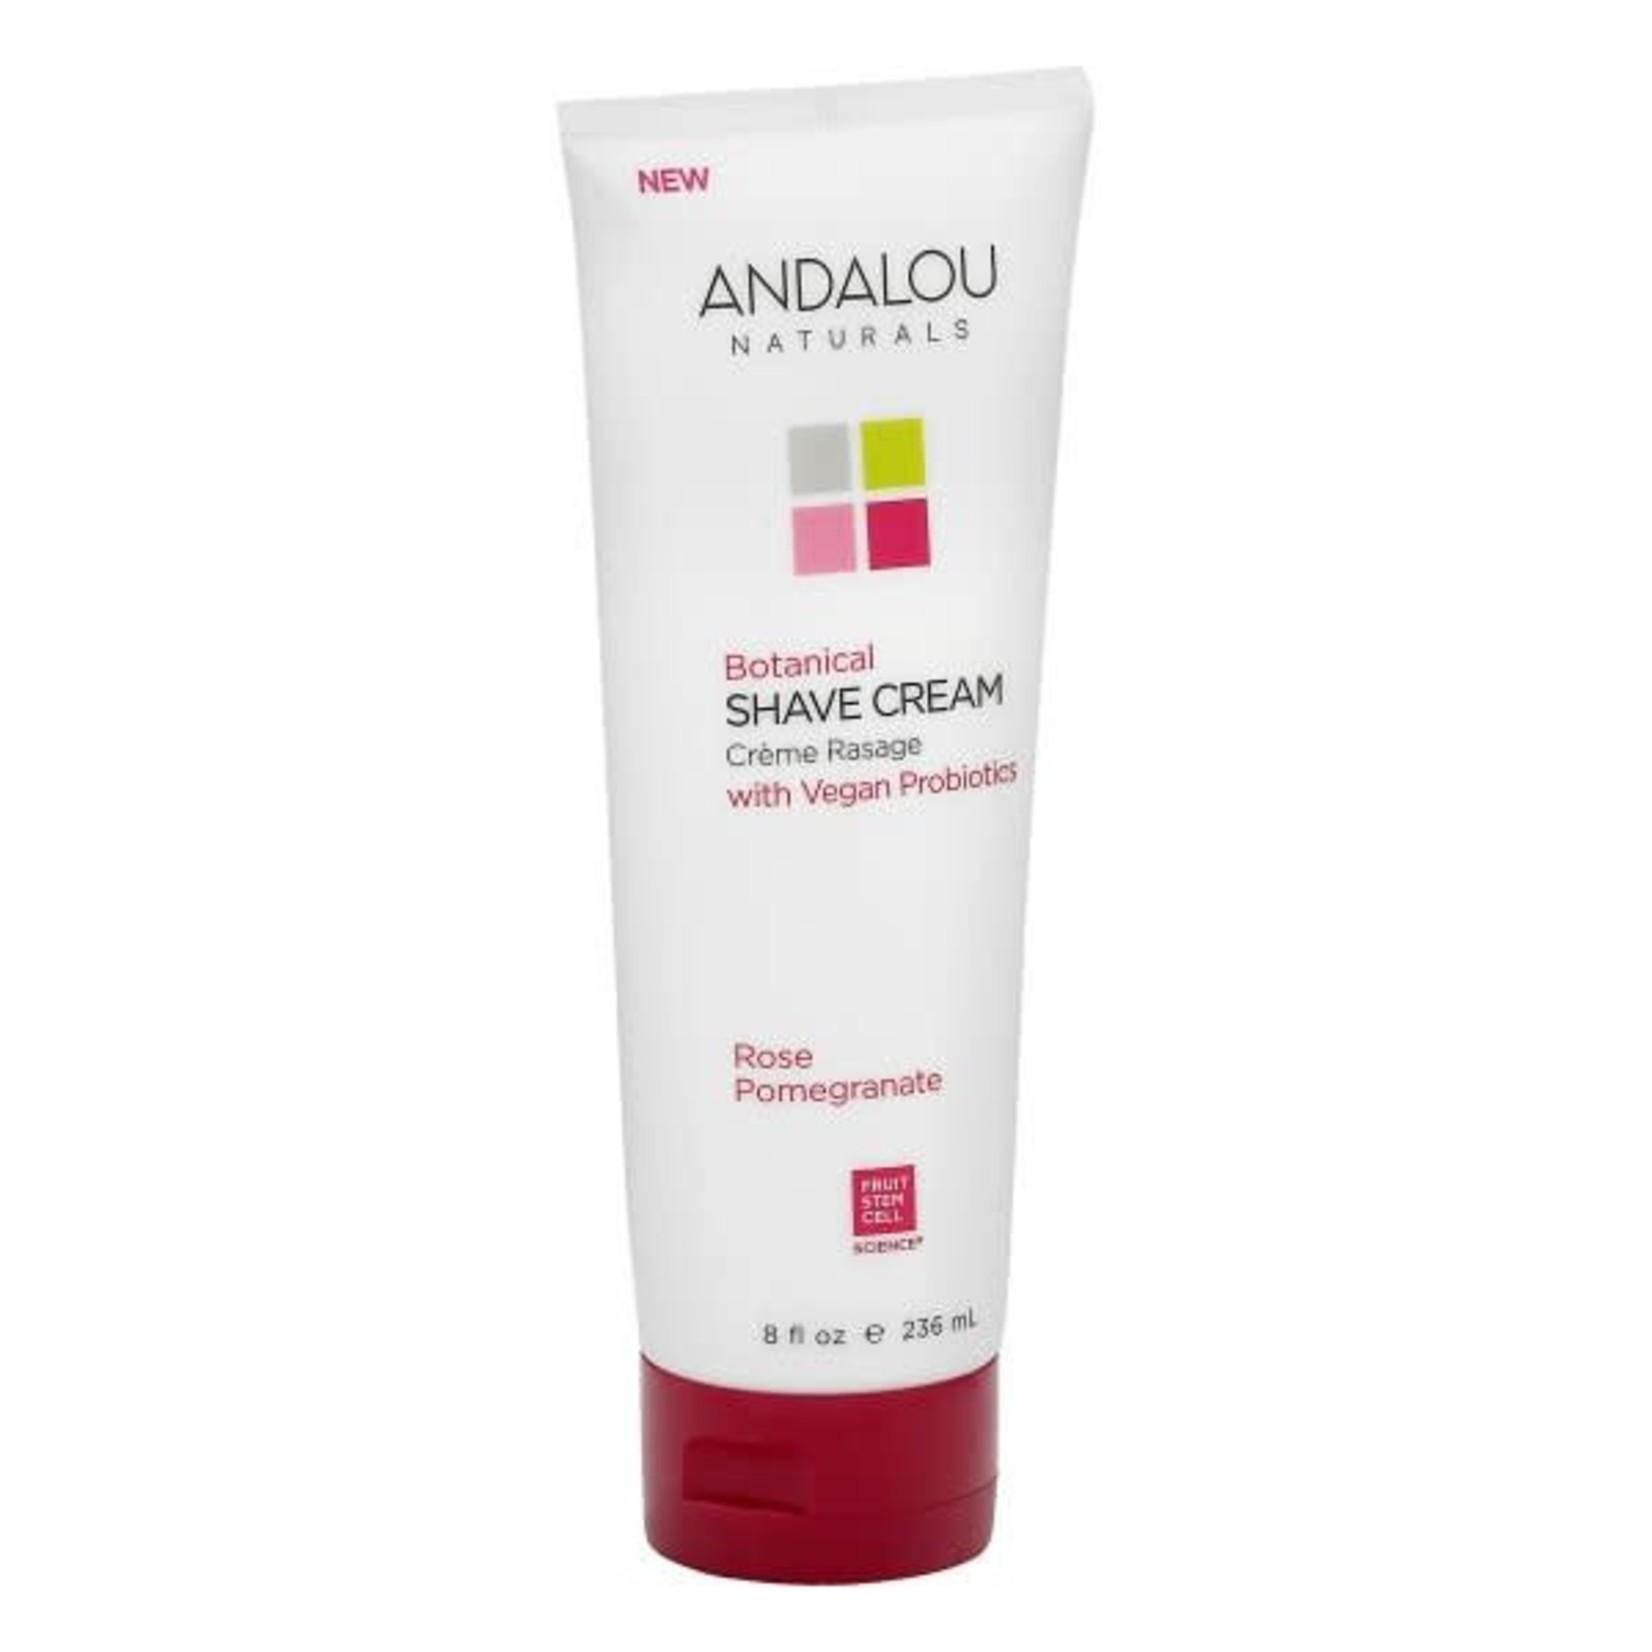 Andalou Andalou Botanical Shave Cream Rose Pomegranate 236ml